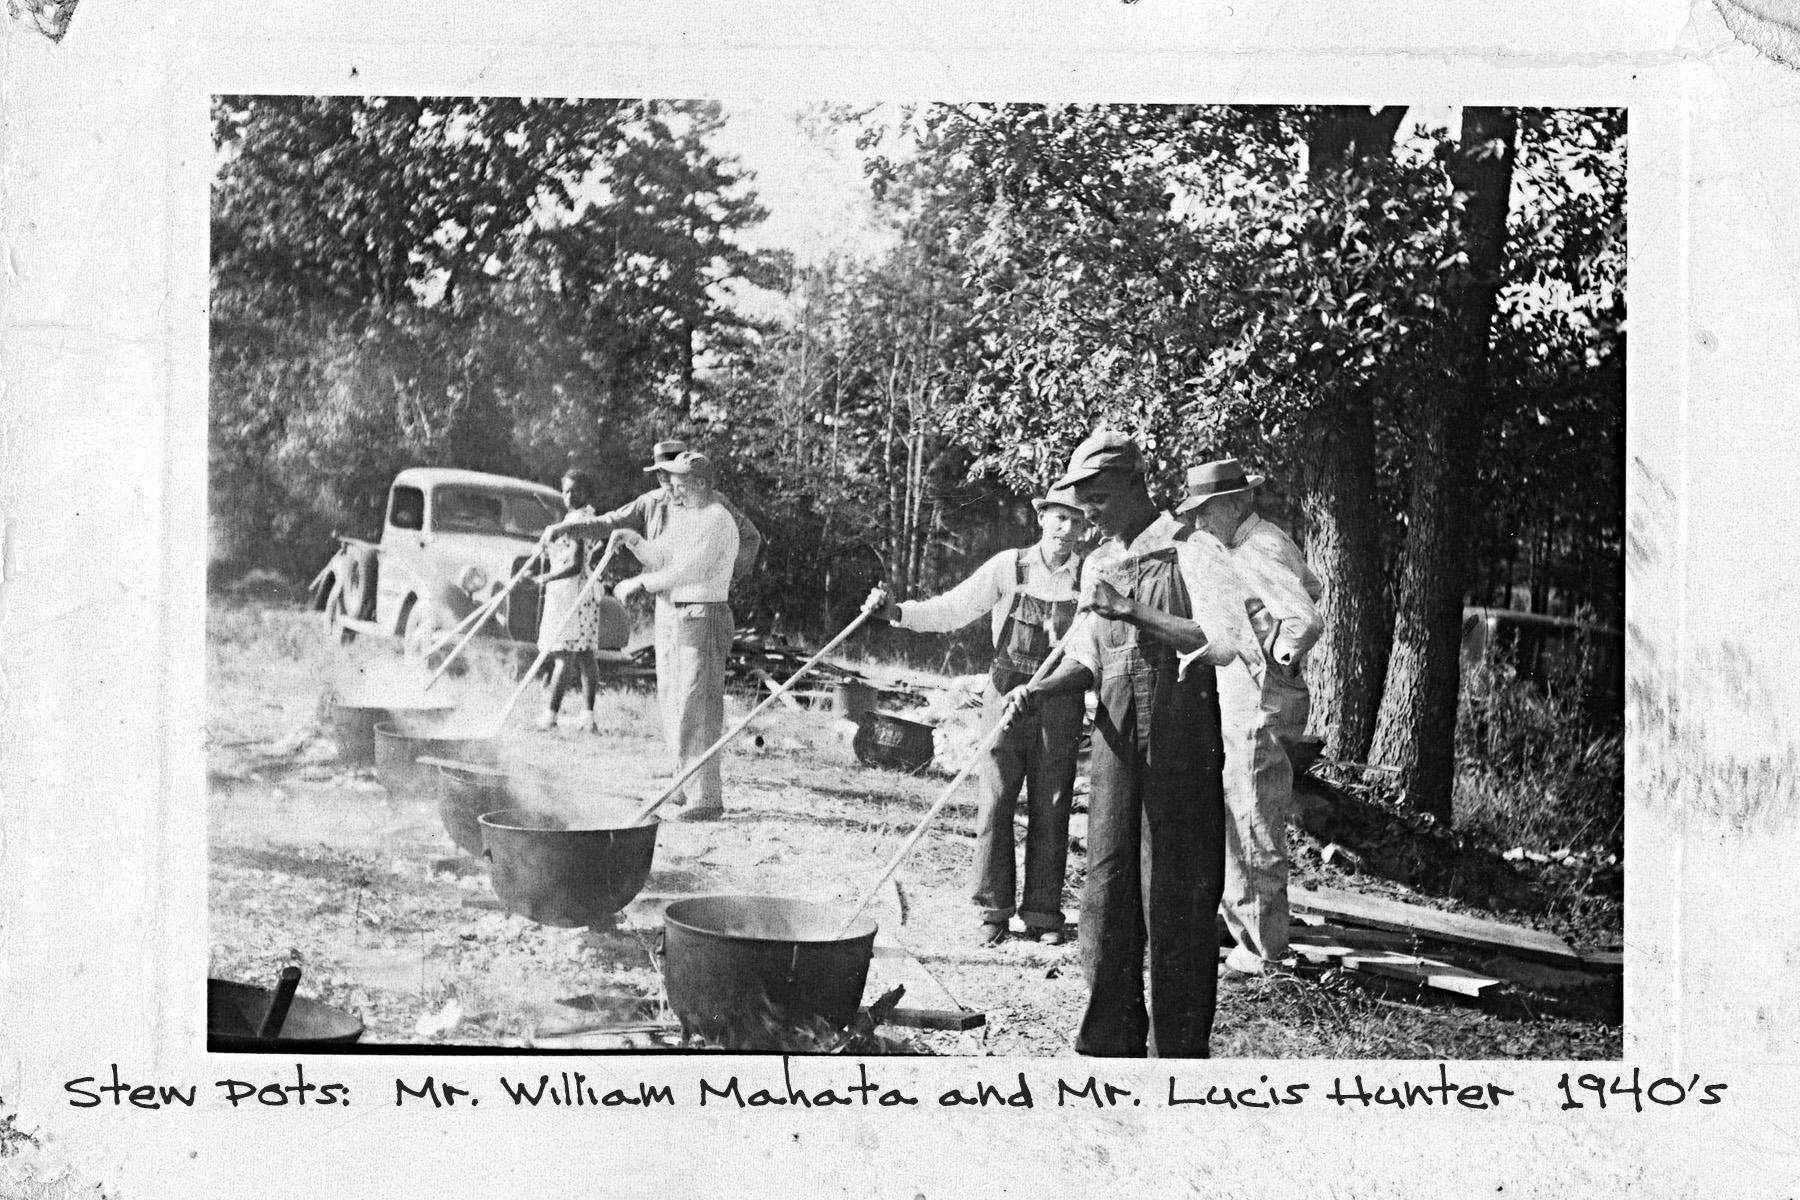 Stew Pots Mr. Lucis Hunter (back) Mr. William Mahata (front) 1940